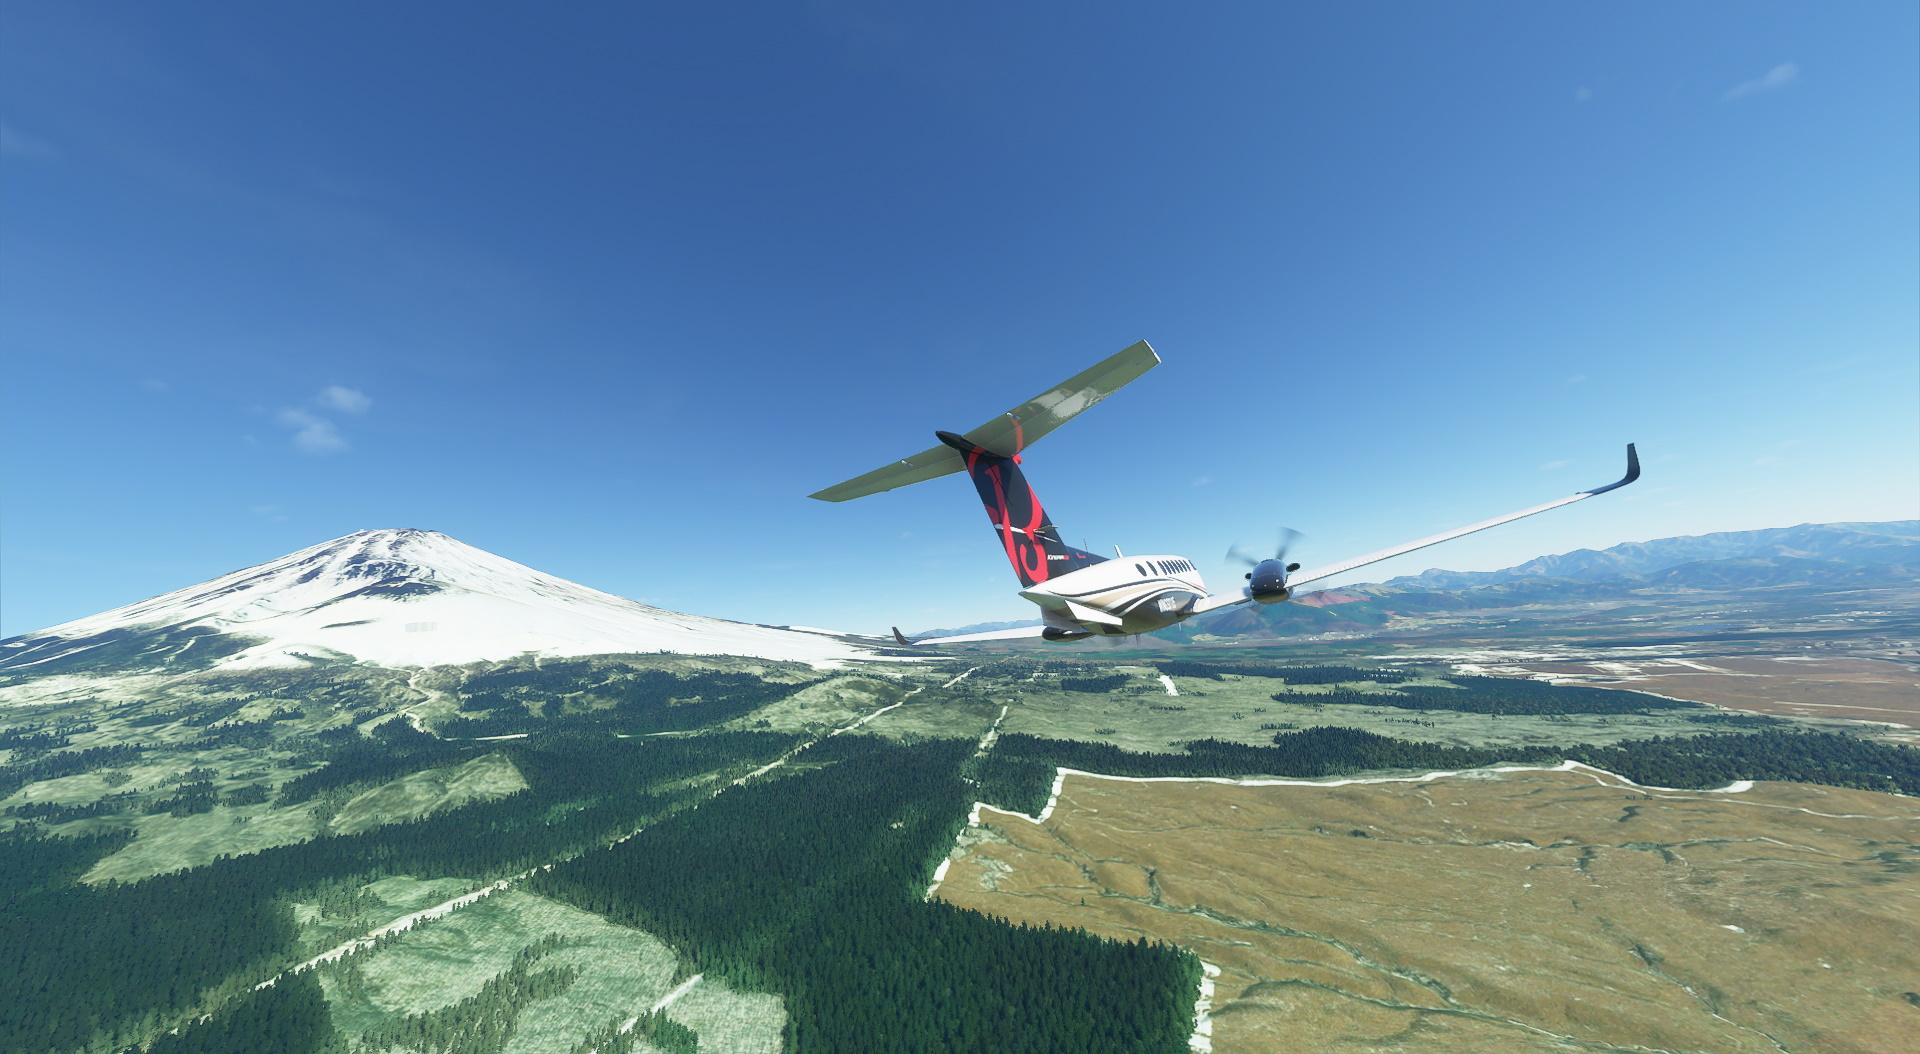 Microsoft Flight Simulator King Air And Mt Fuji